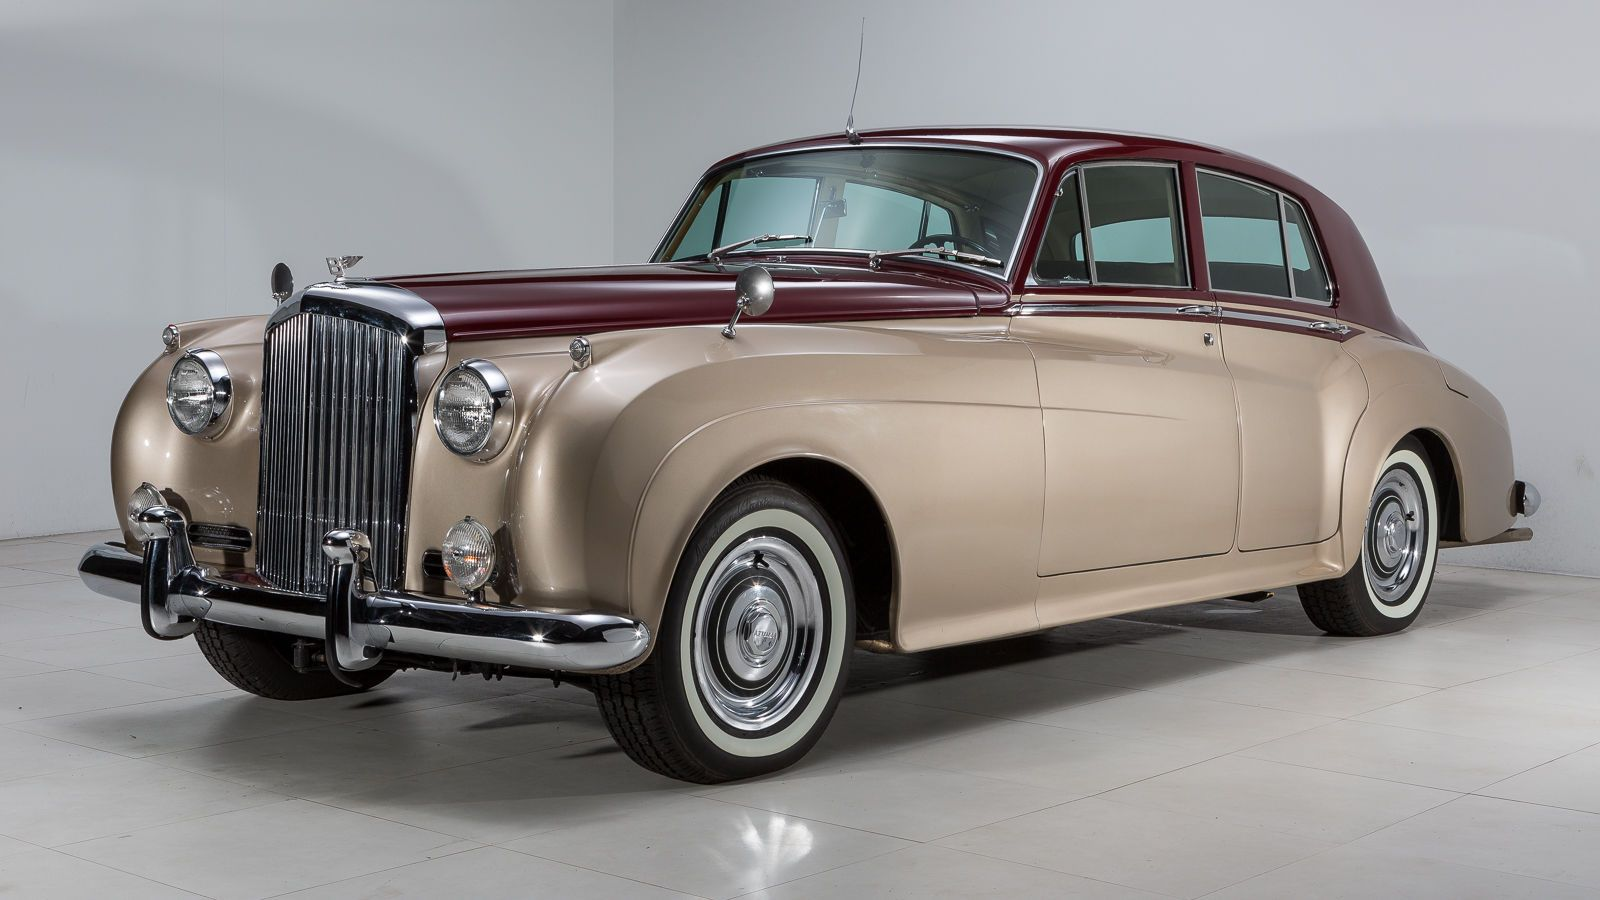 Luxury Limousine Vintage Bentley Rolls Royce Classic Cars